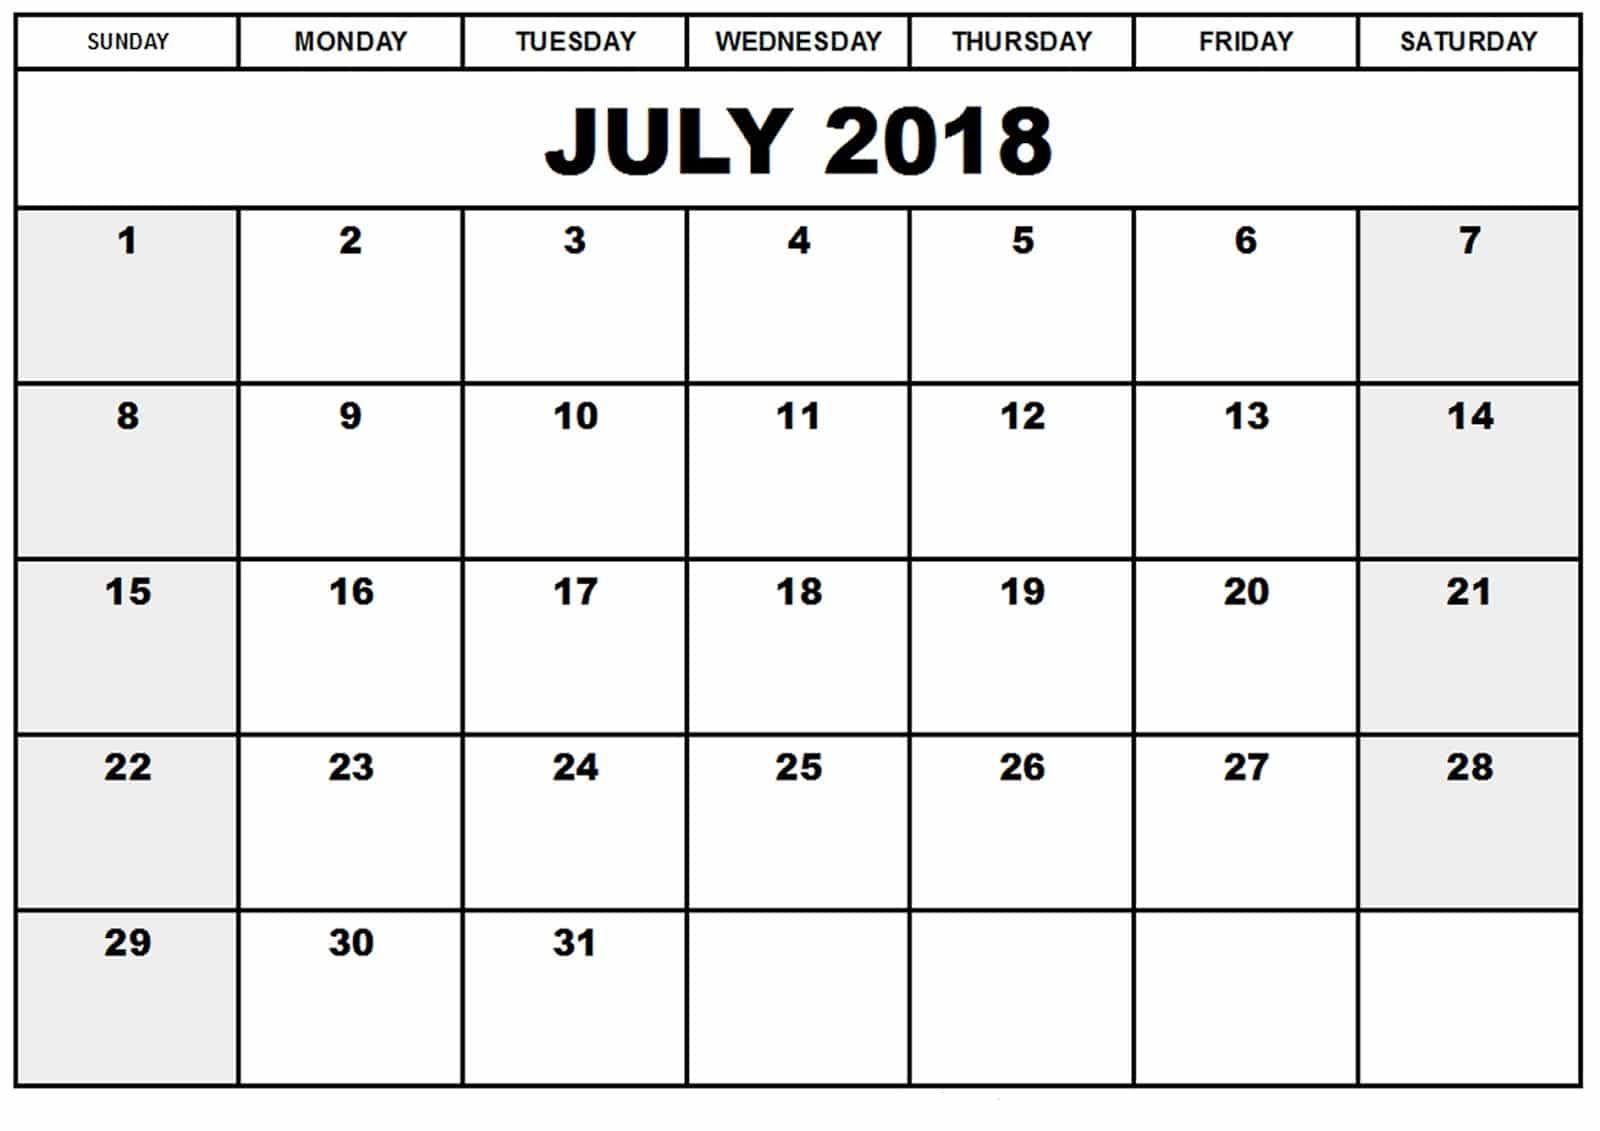 July 2018 Calendar Printable